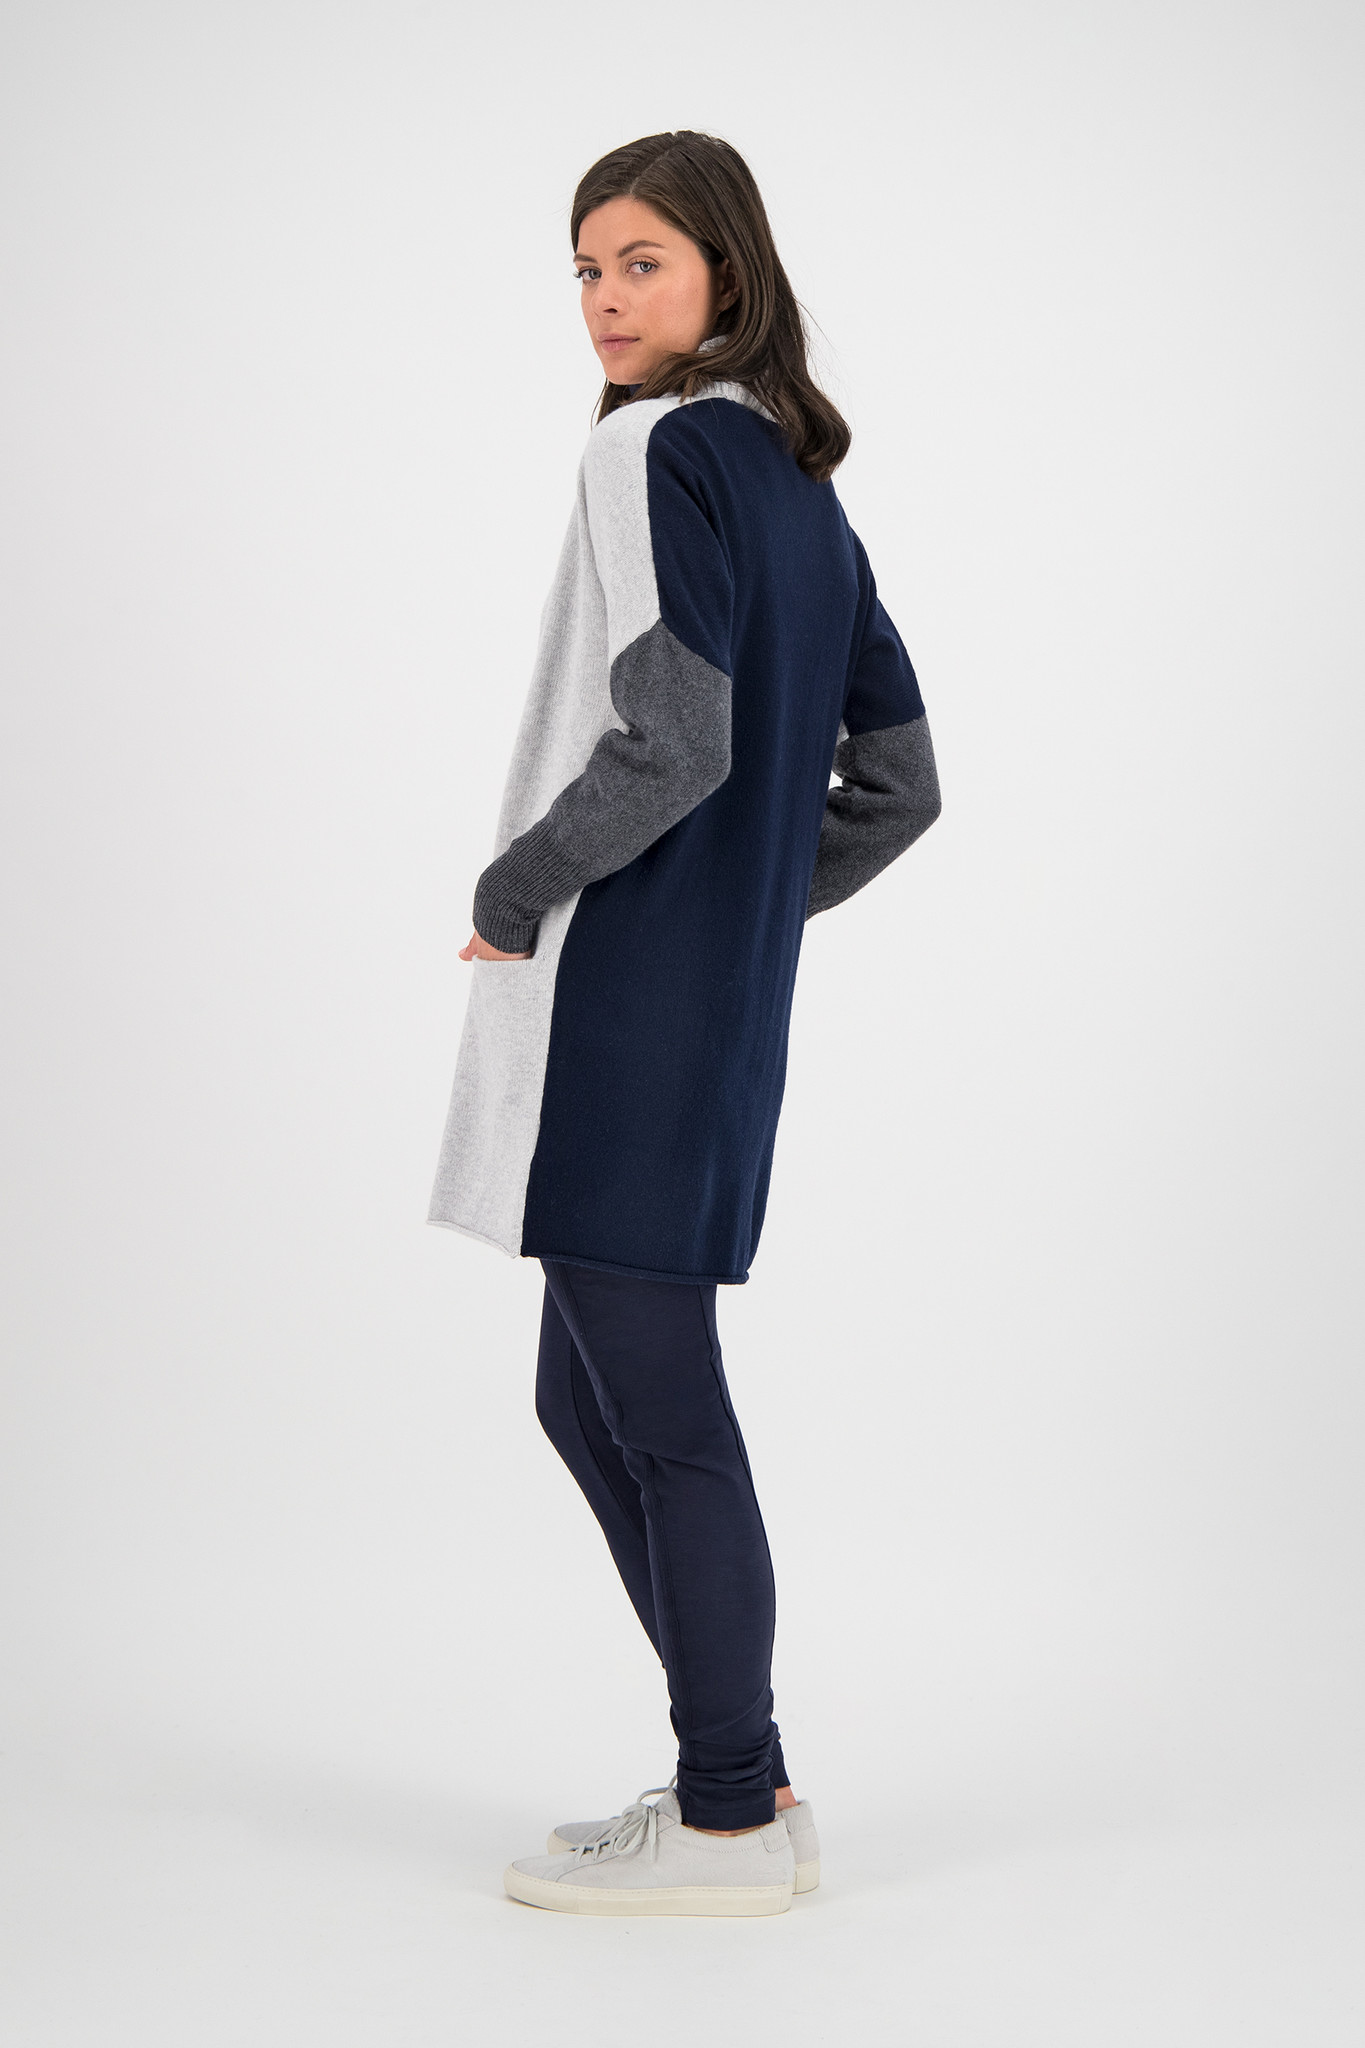 SYLVER Superb Cardigan - Light Grey